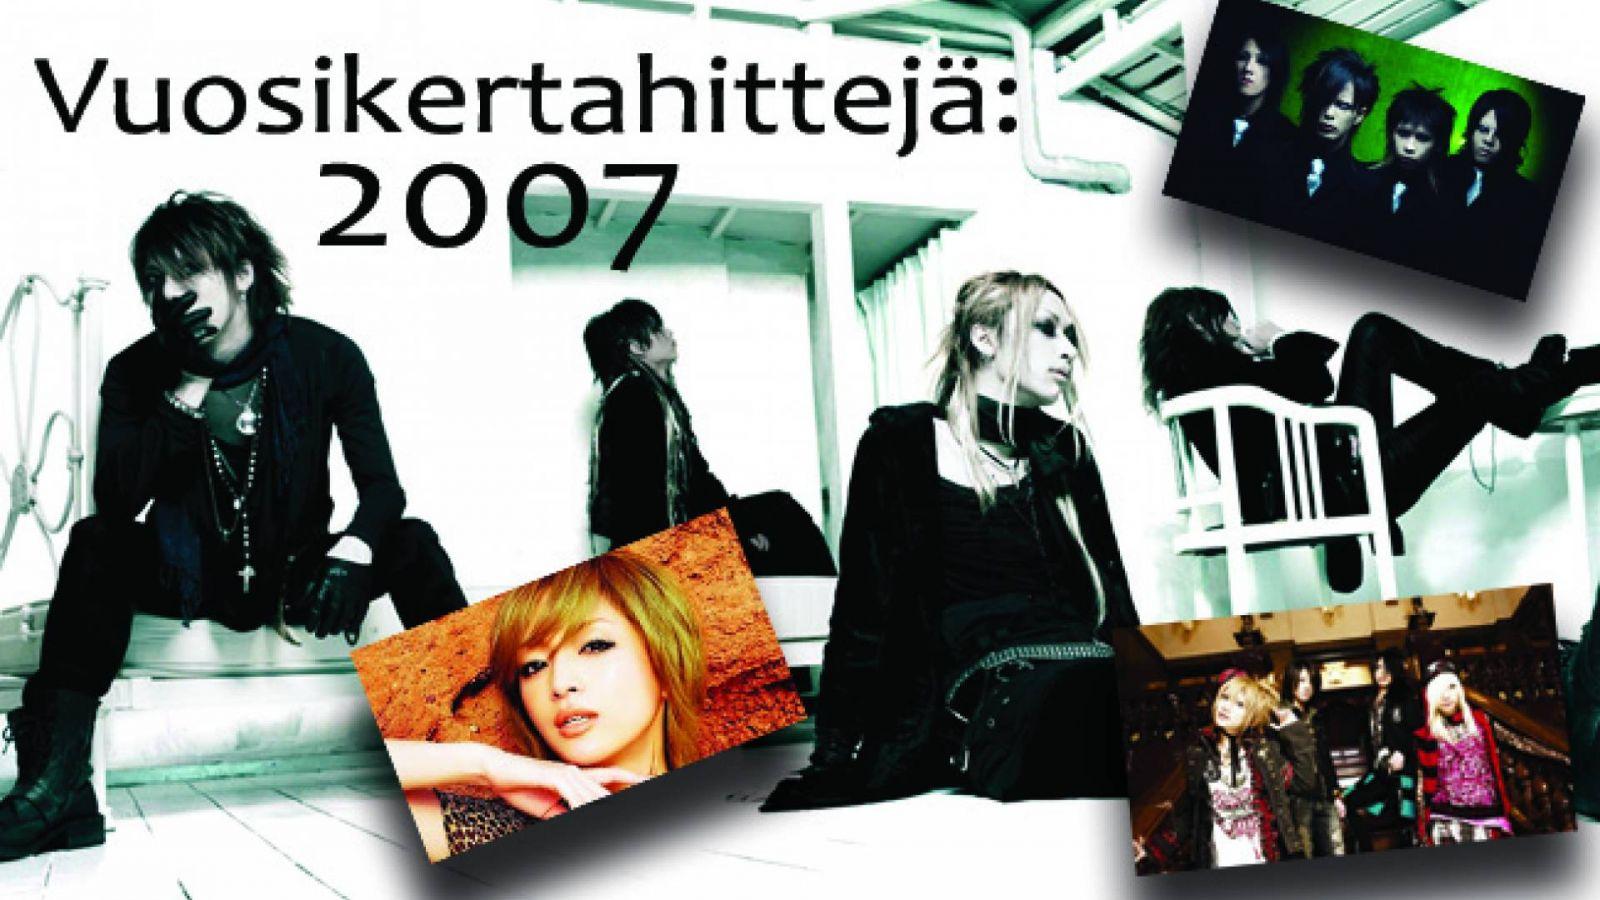 Vuosikertahittejä: 2007 © JaME Suomi, Niina Pasto